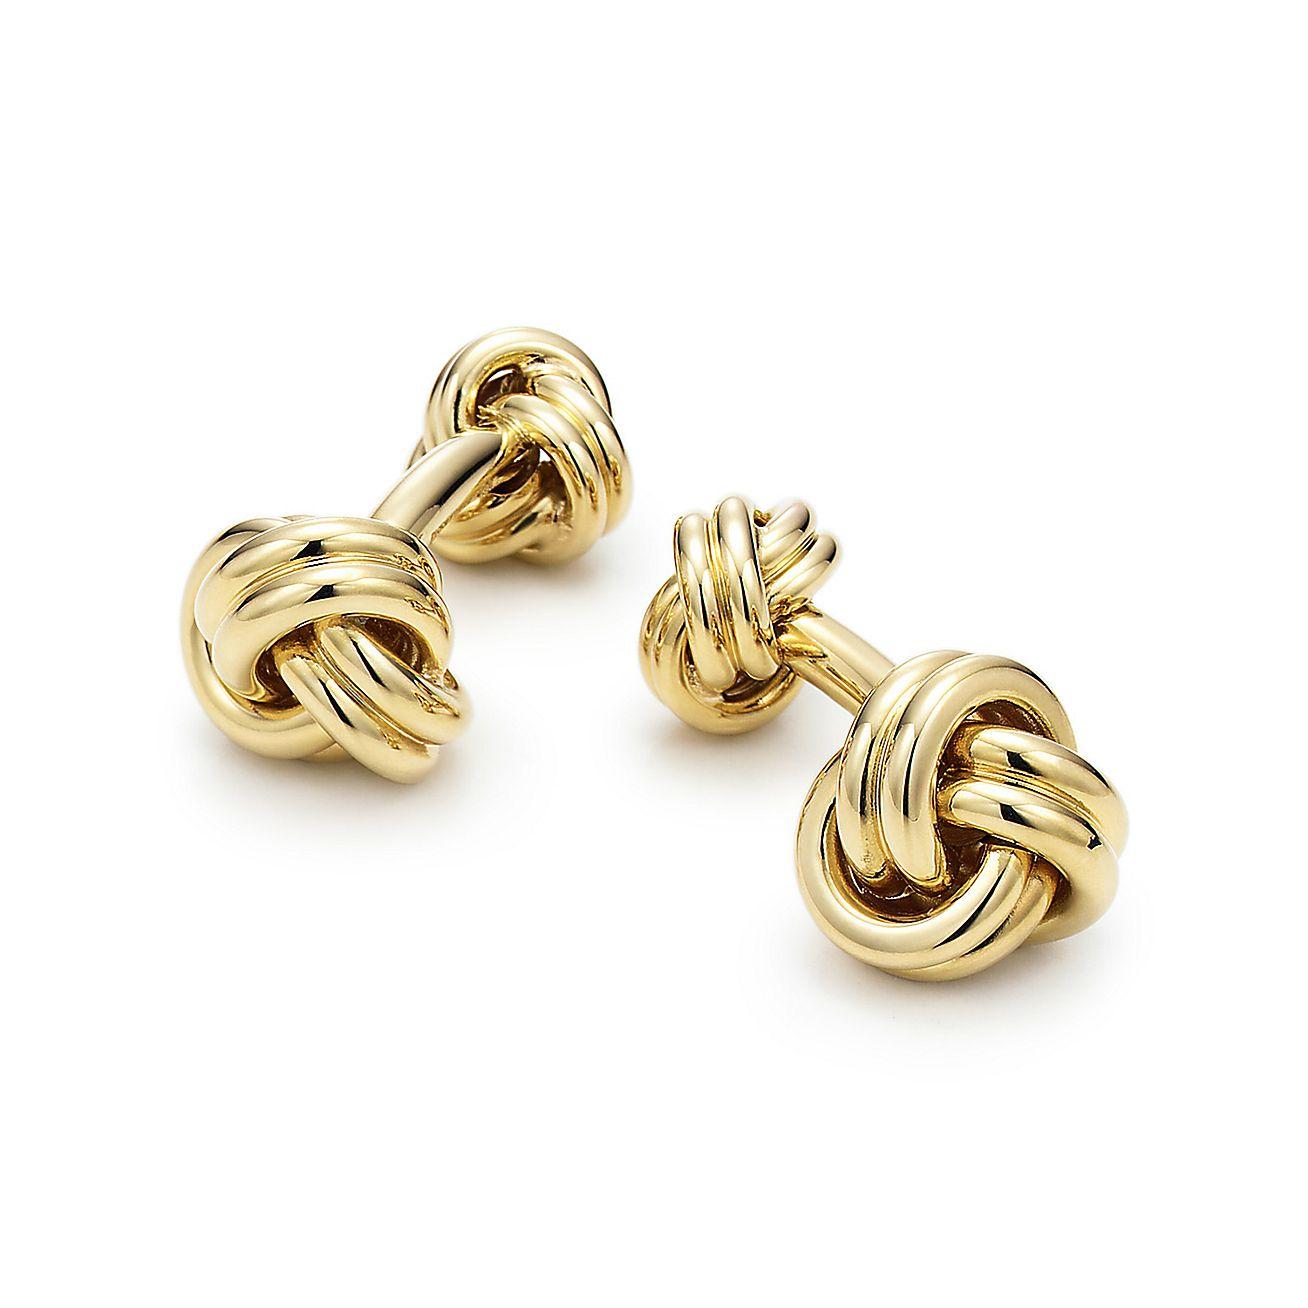 Knot Cuff Links